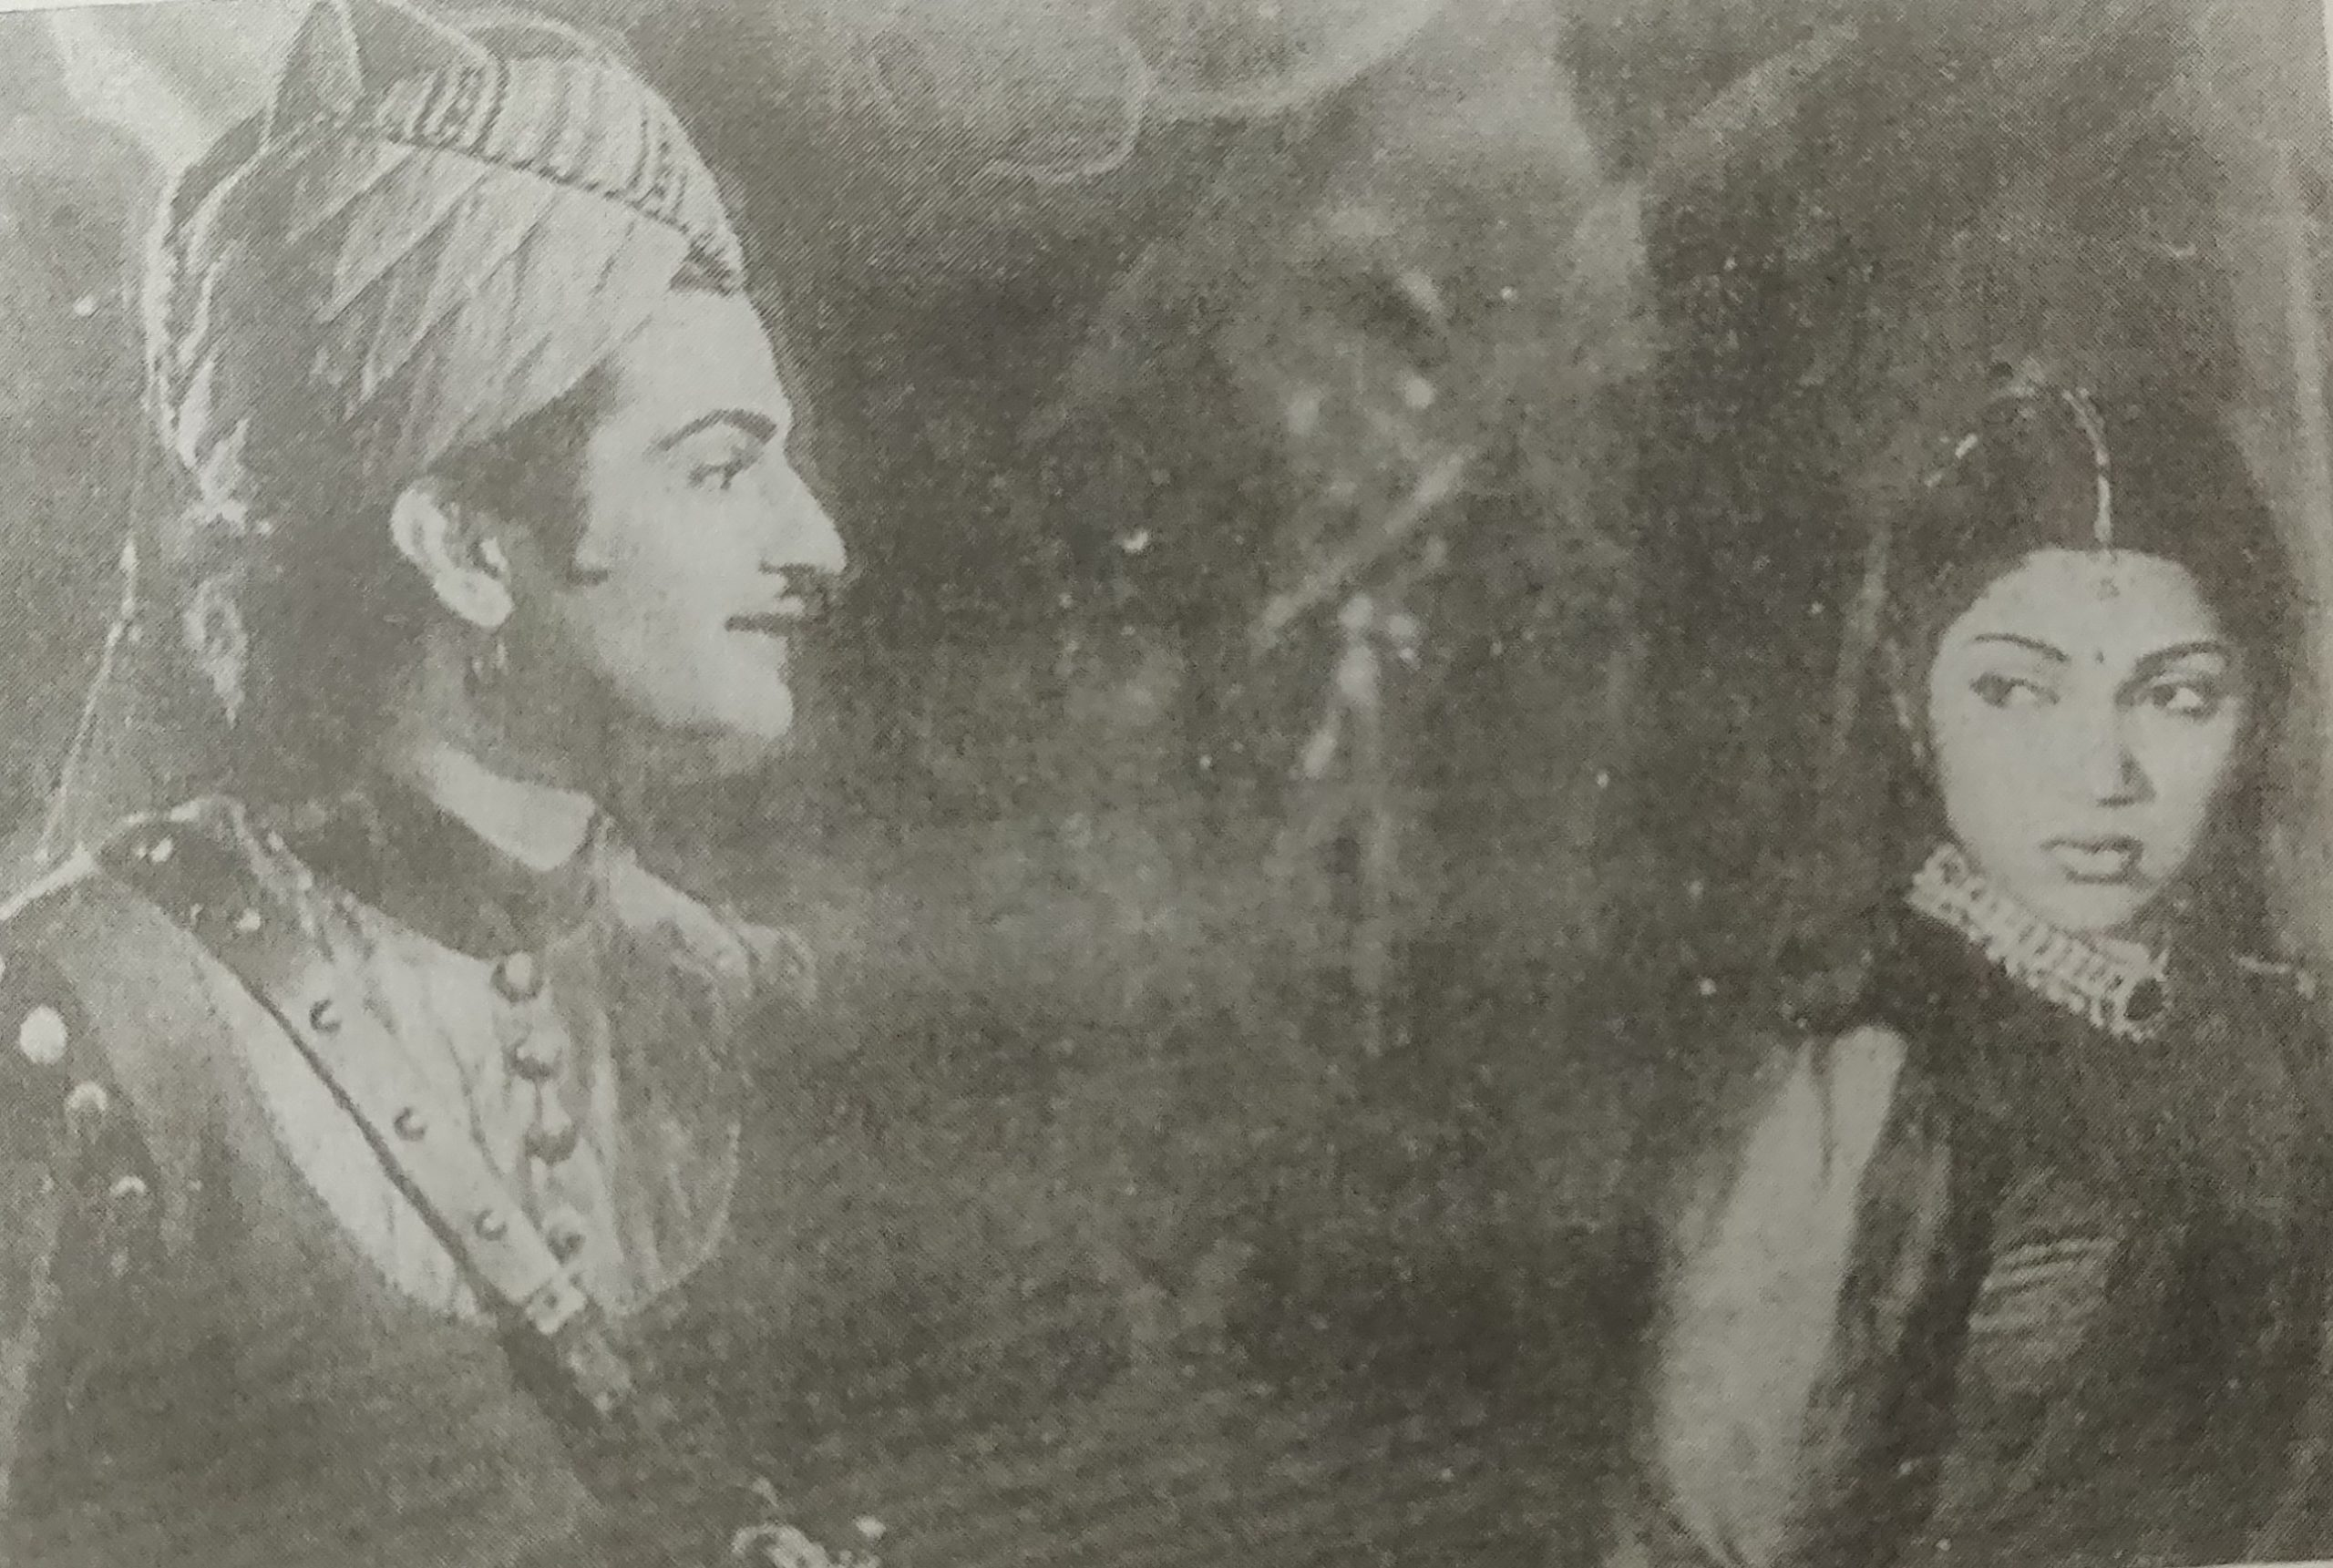 Chandirani (1953): Bhanumathi Ramakrishna's Excellence #TeluguCinemaHistory